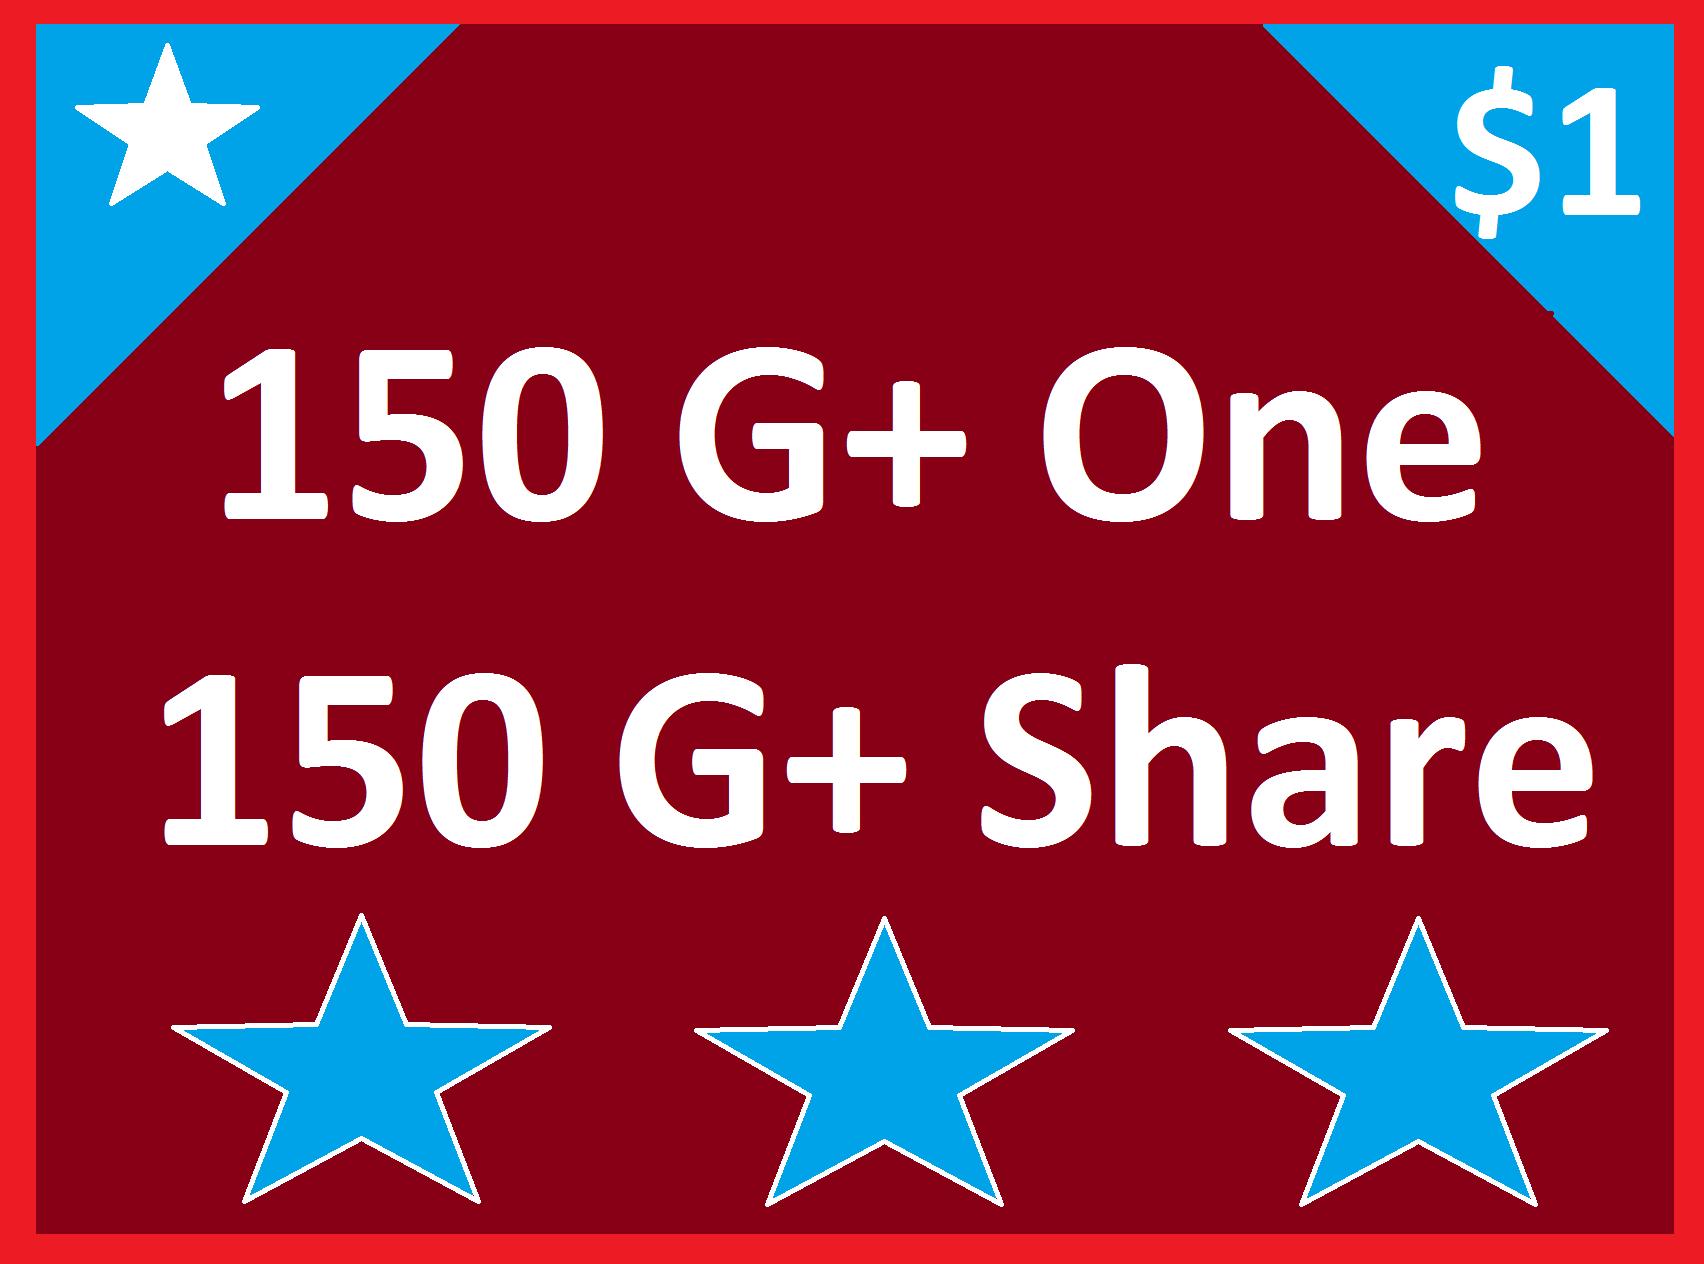 150 Google Plus One + 150 Google Plus Share Social Signals Improve Your Website Ranking